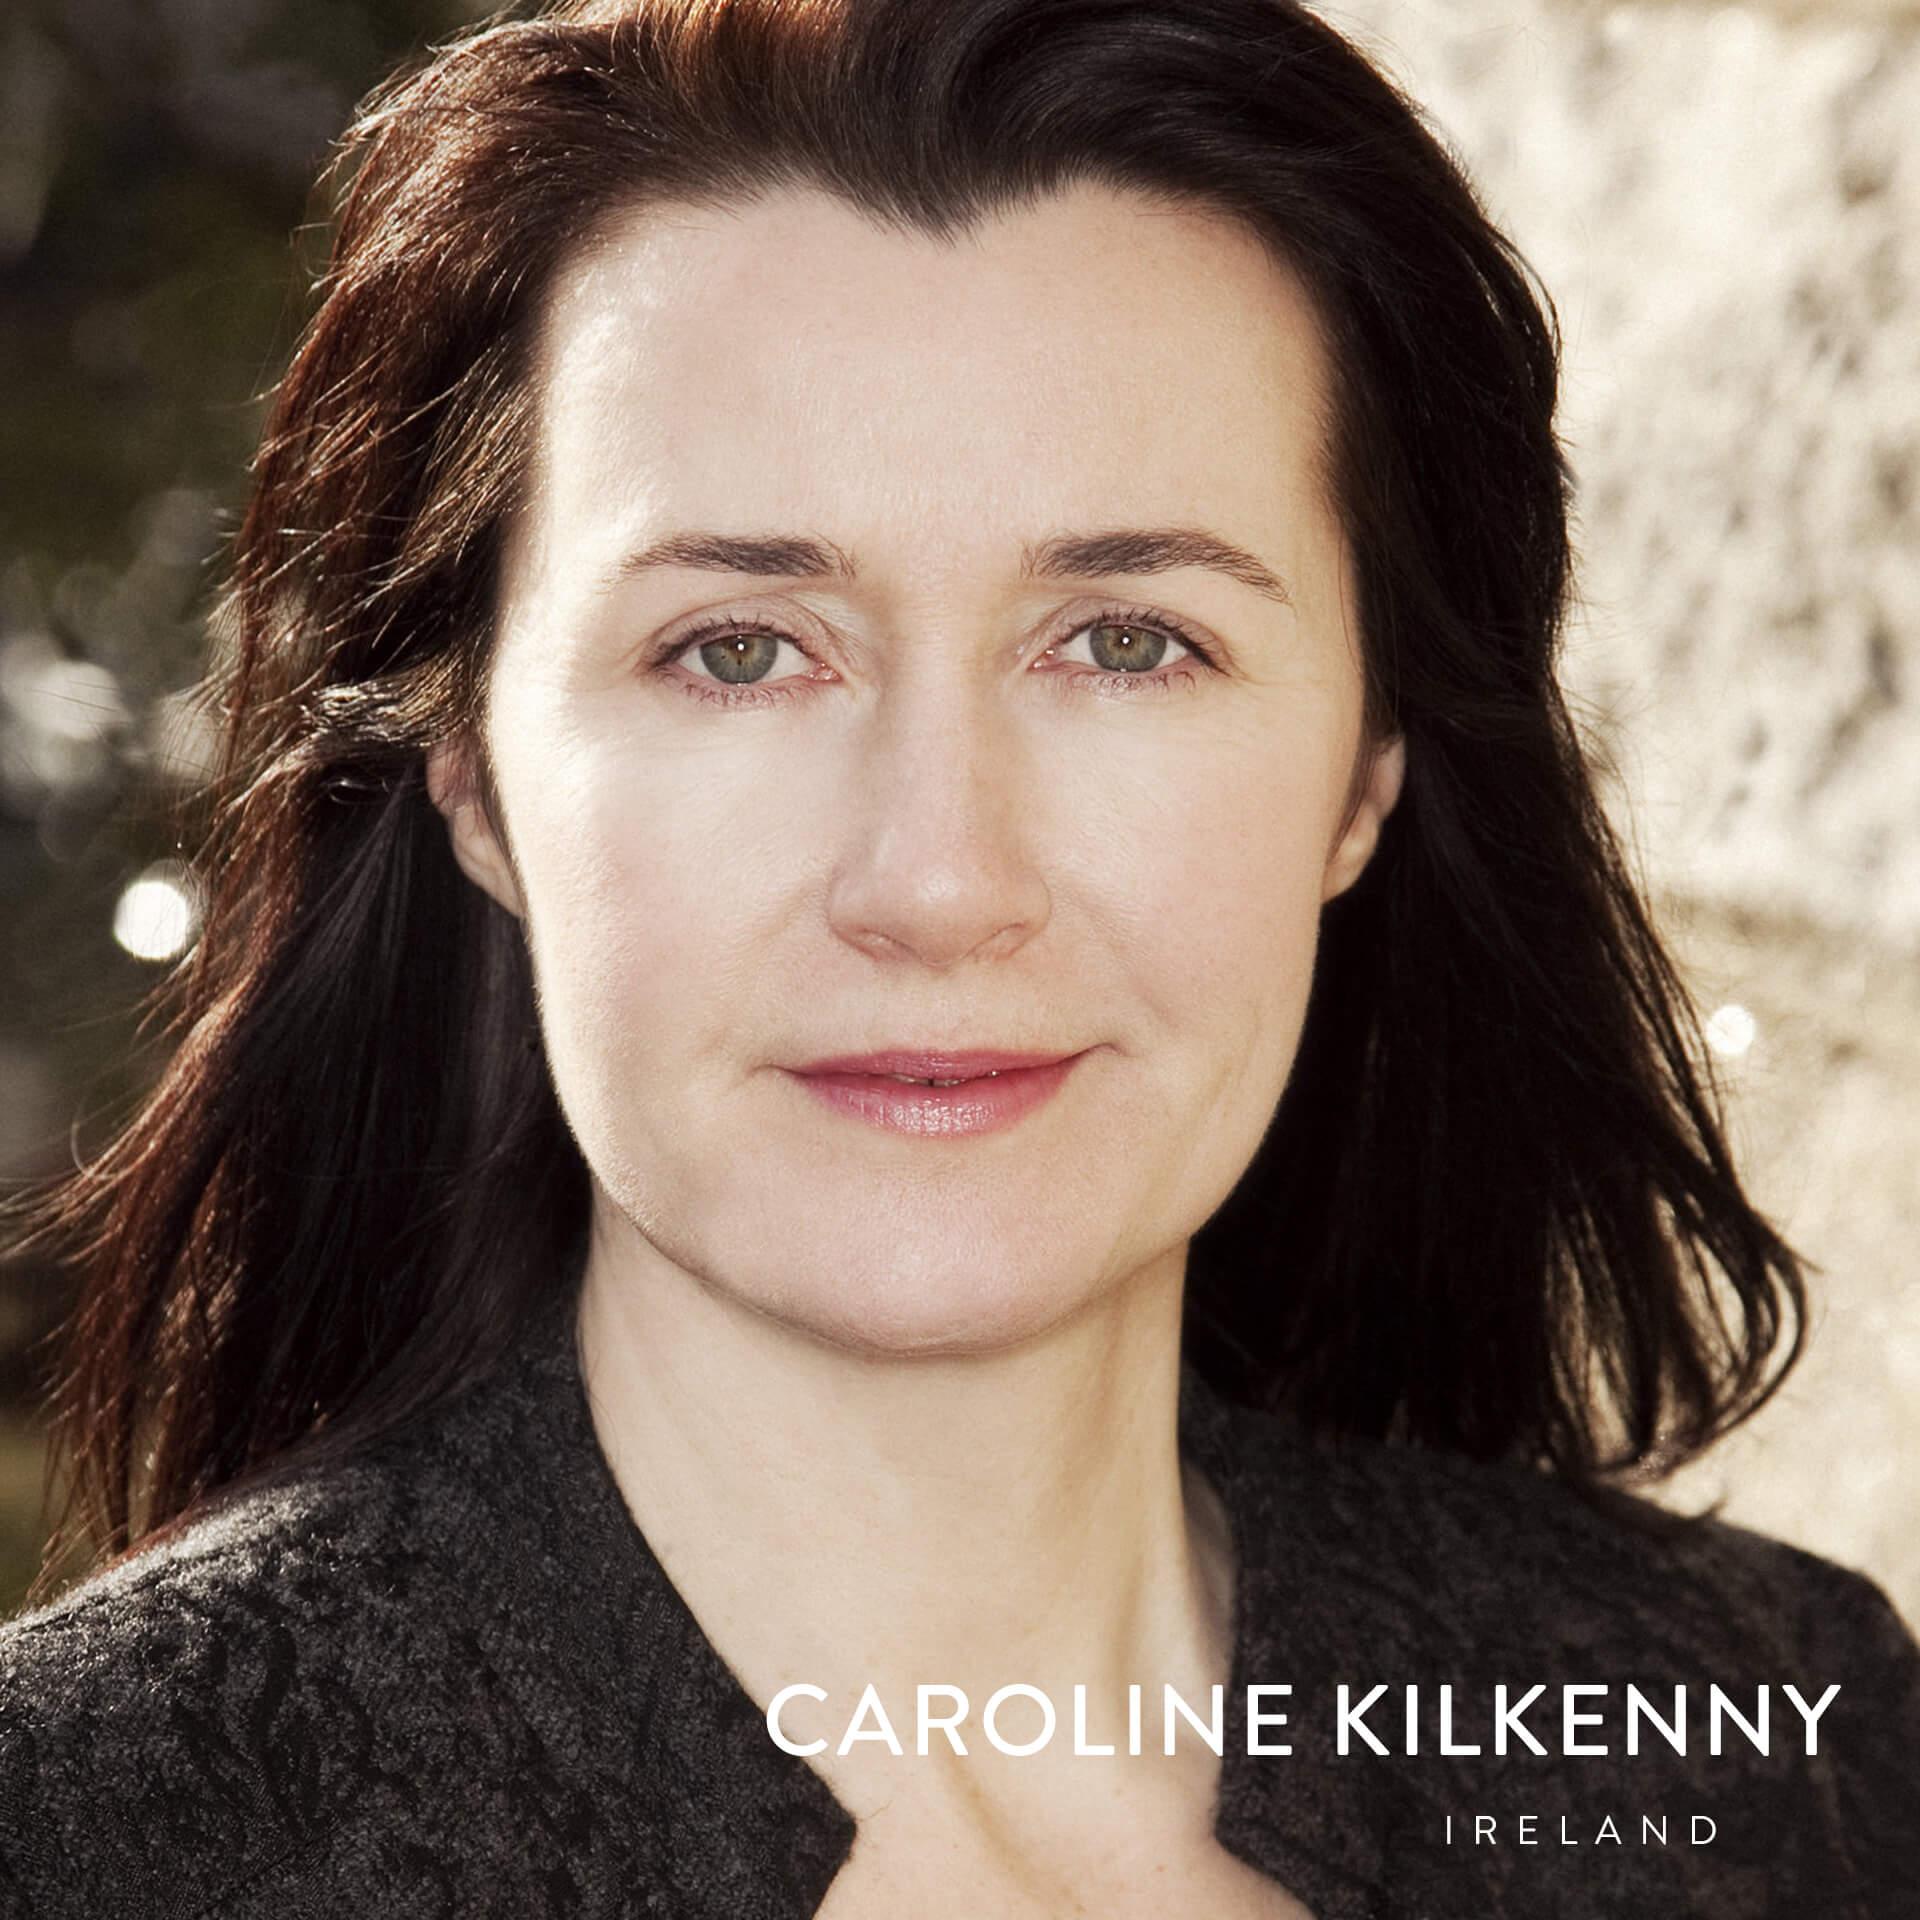 Caroline Kilkenny